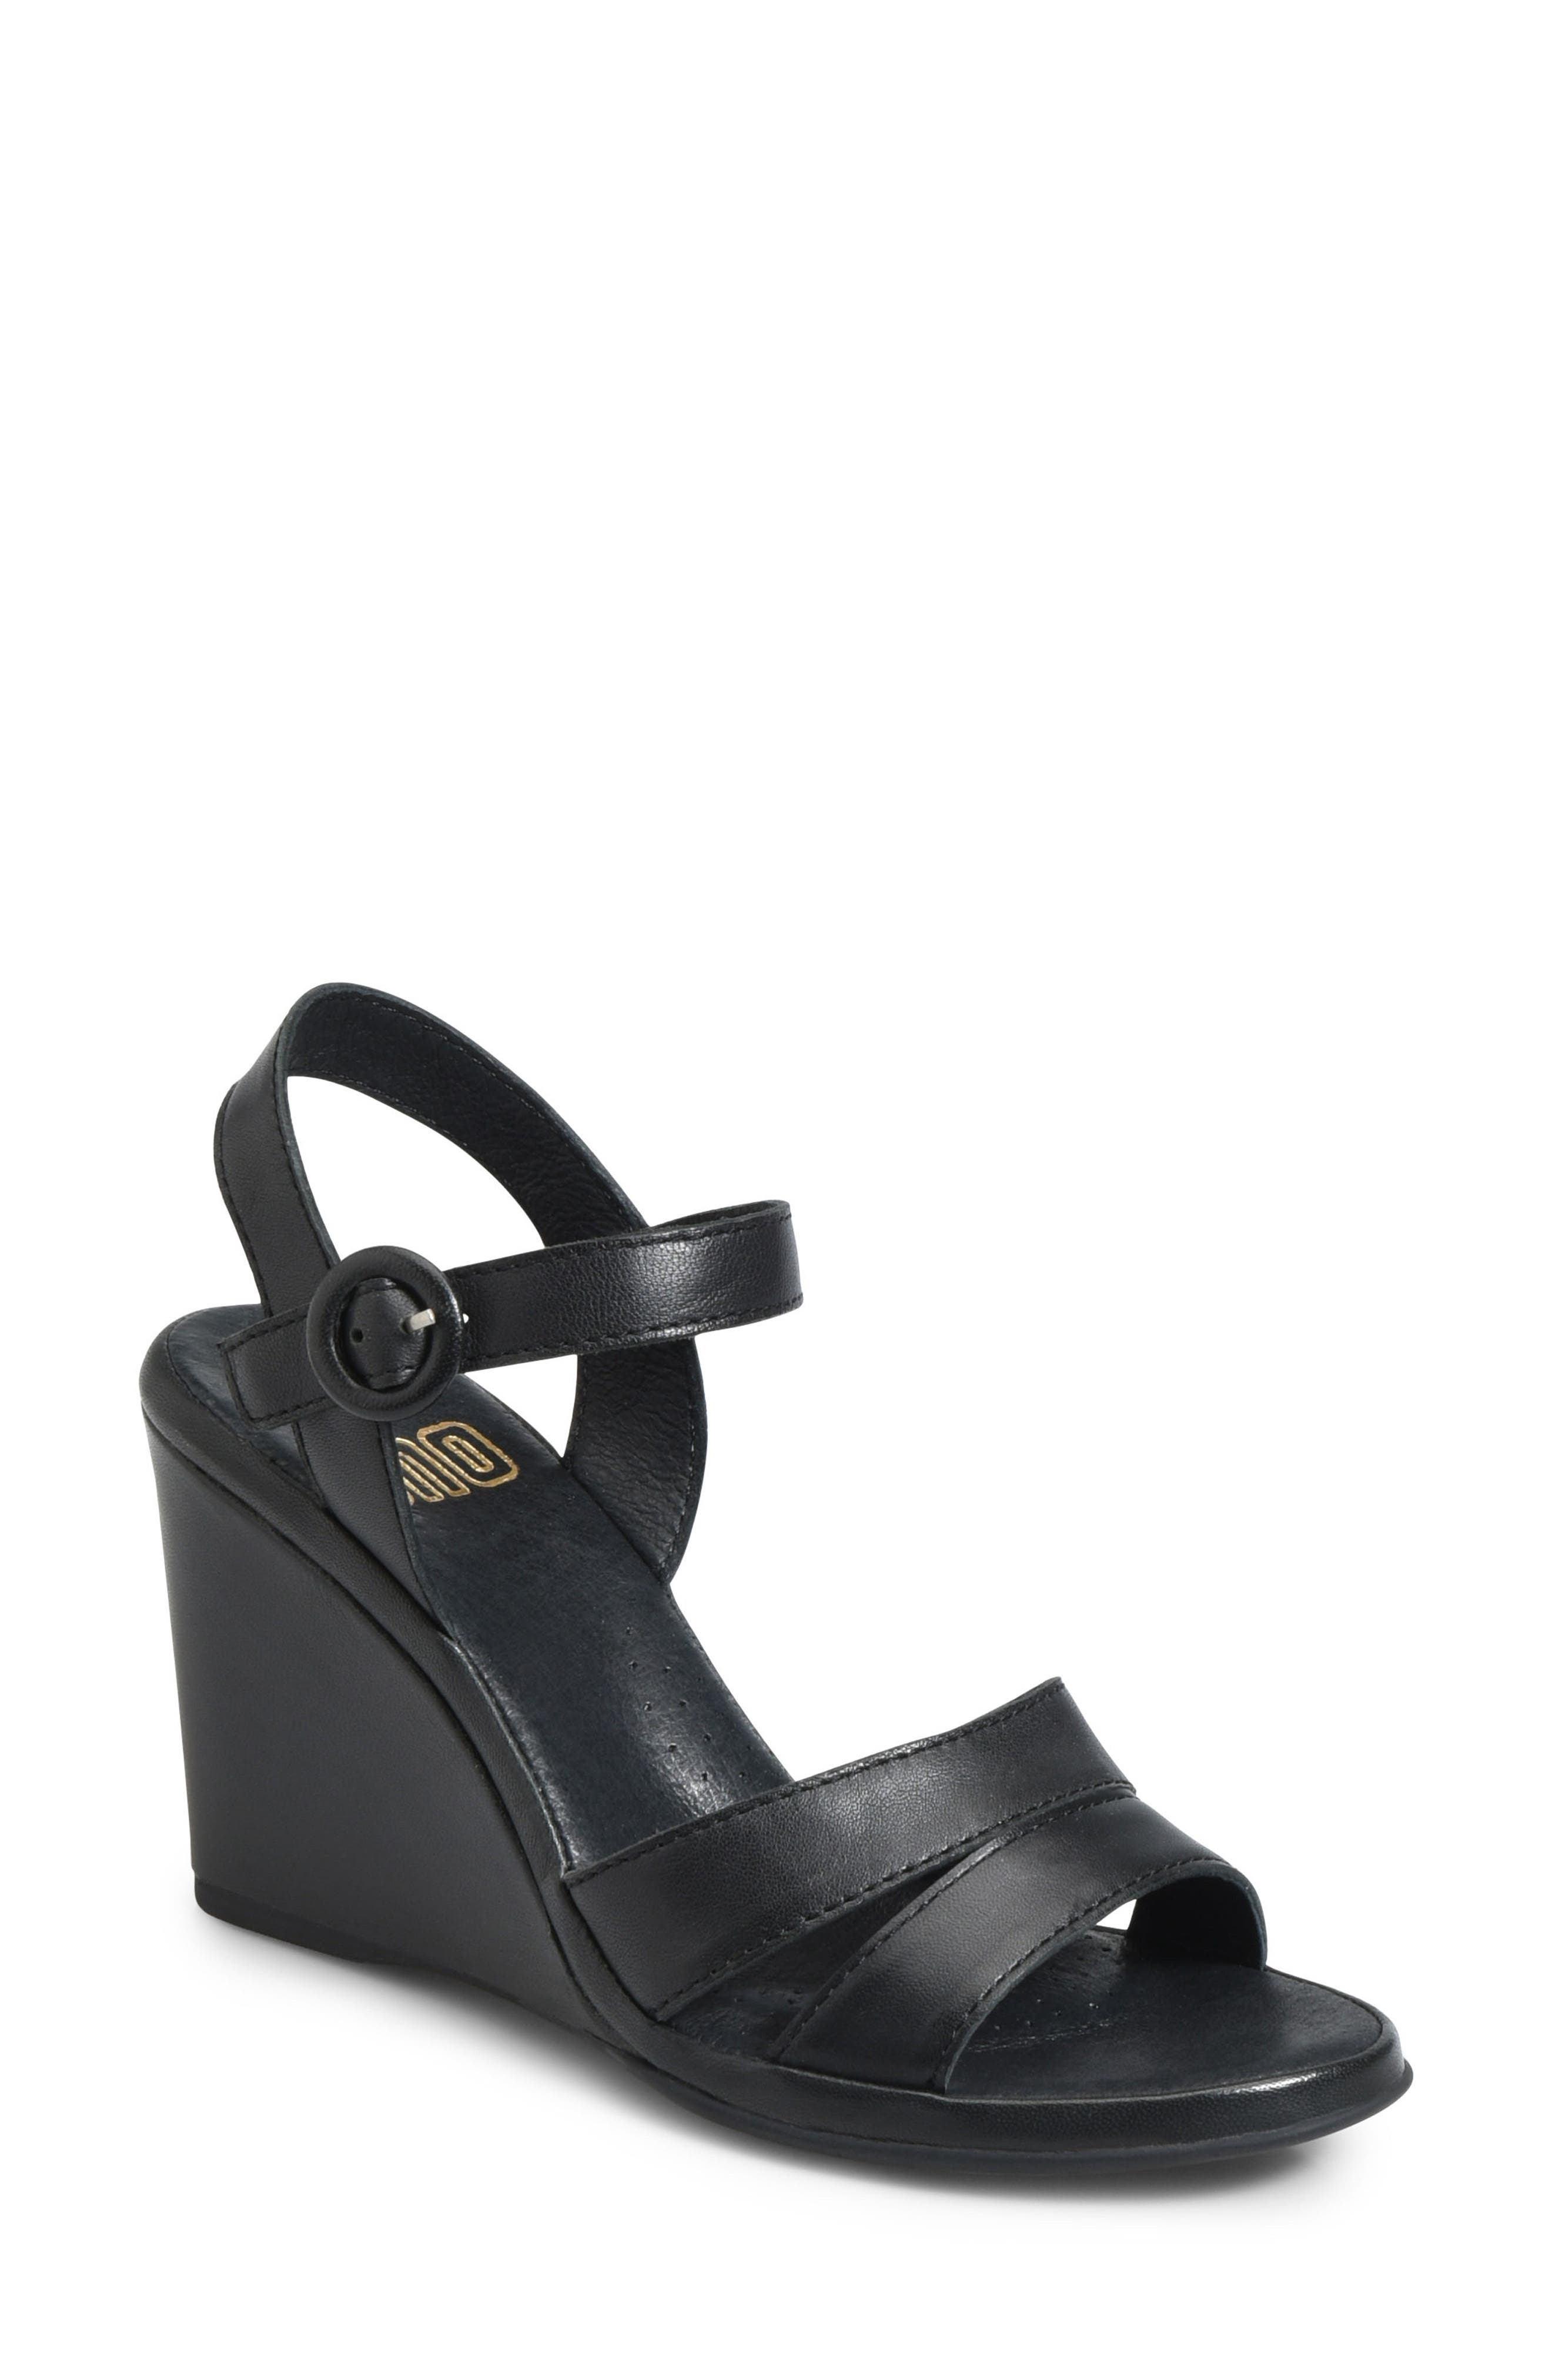 Hydro Wedge Sandal,                             Main thumbnail 1, color,                             Black Leather